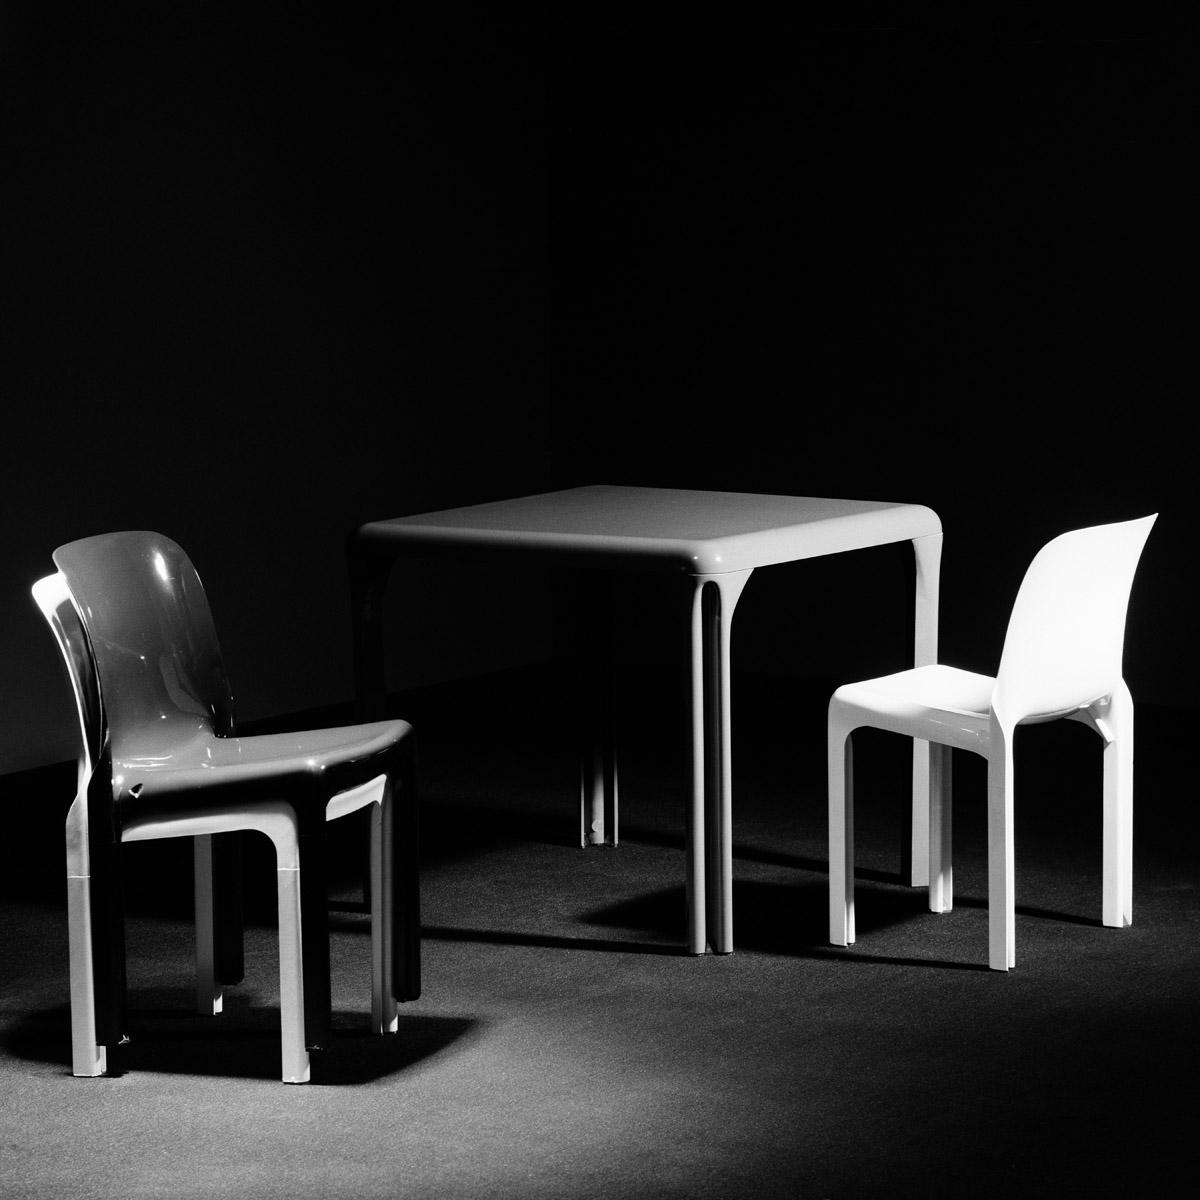 Selene chaise - Stadio 80 - Vico Magistretti - Artemide - Photo Carol-Marc Lavrillier